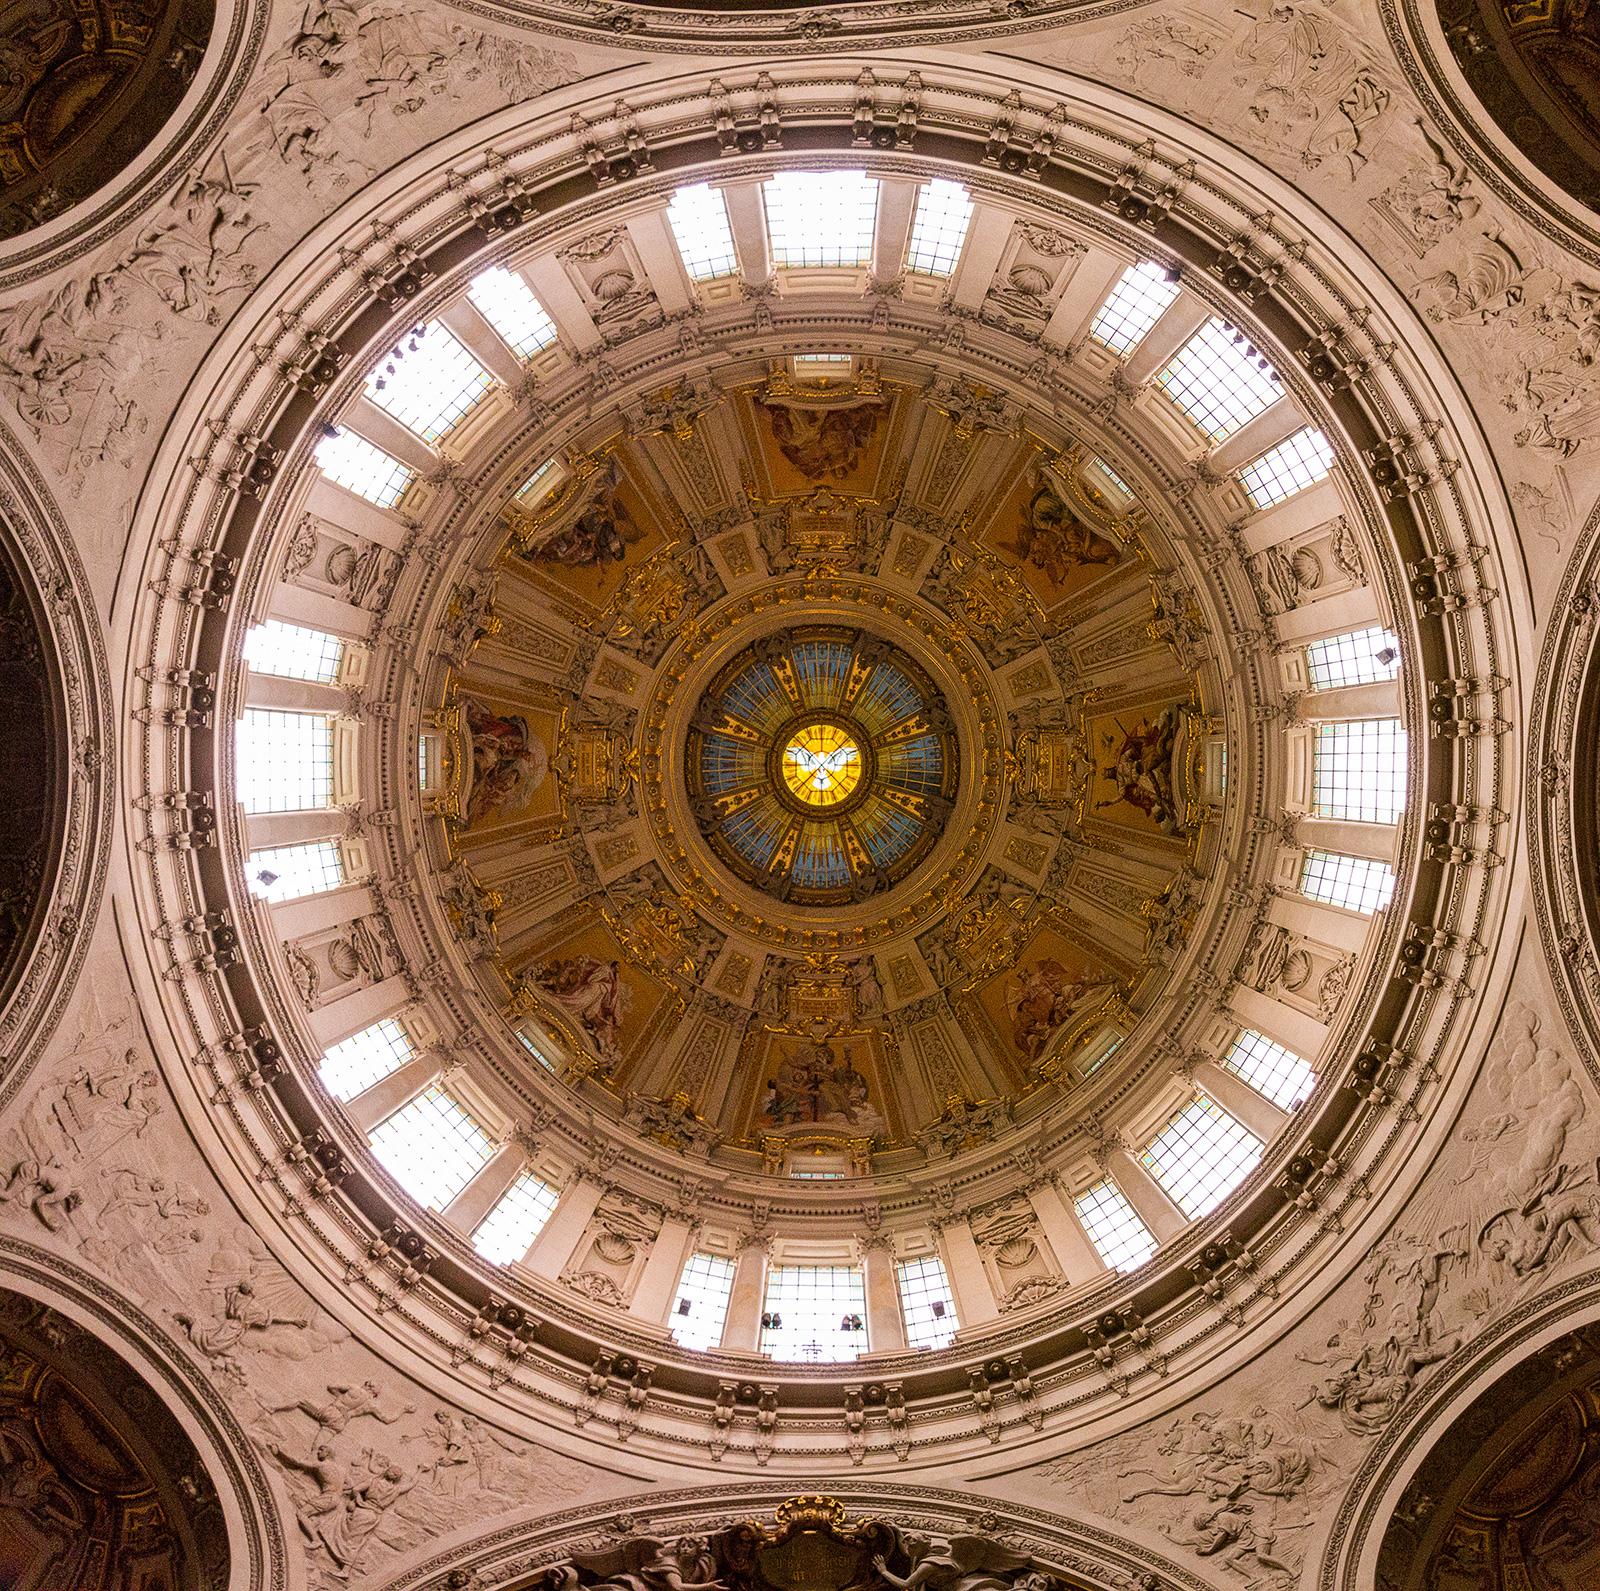 Kuppel im Berliner Dom, Berlin